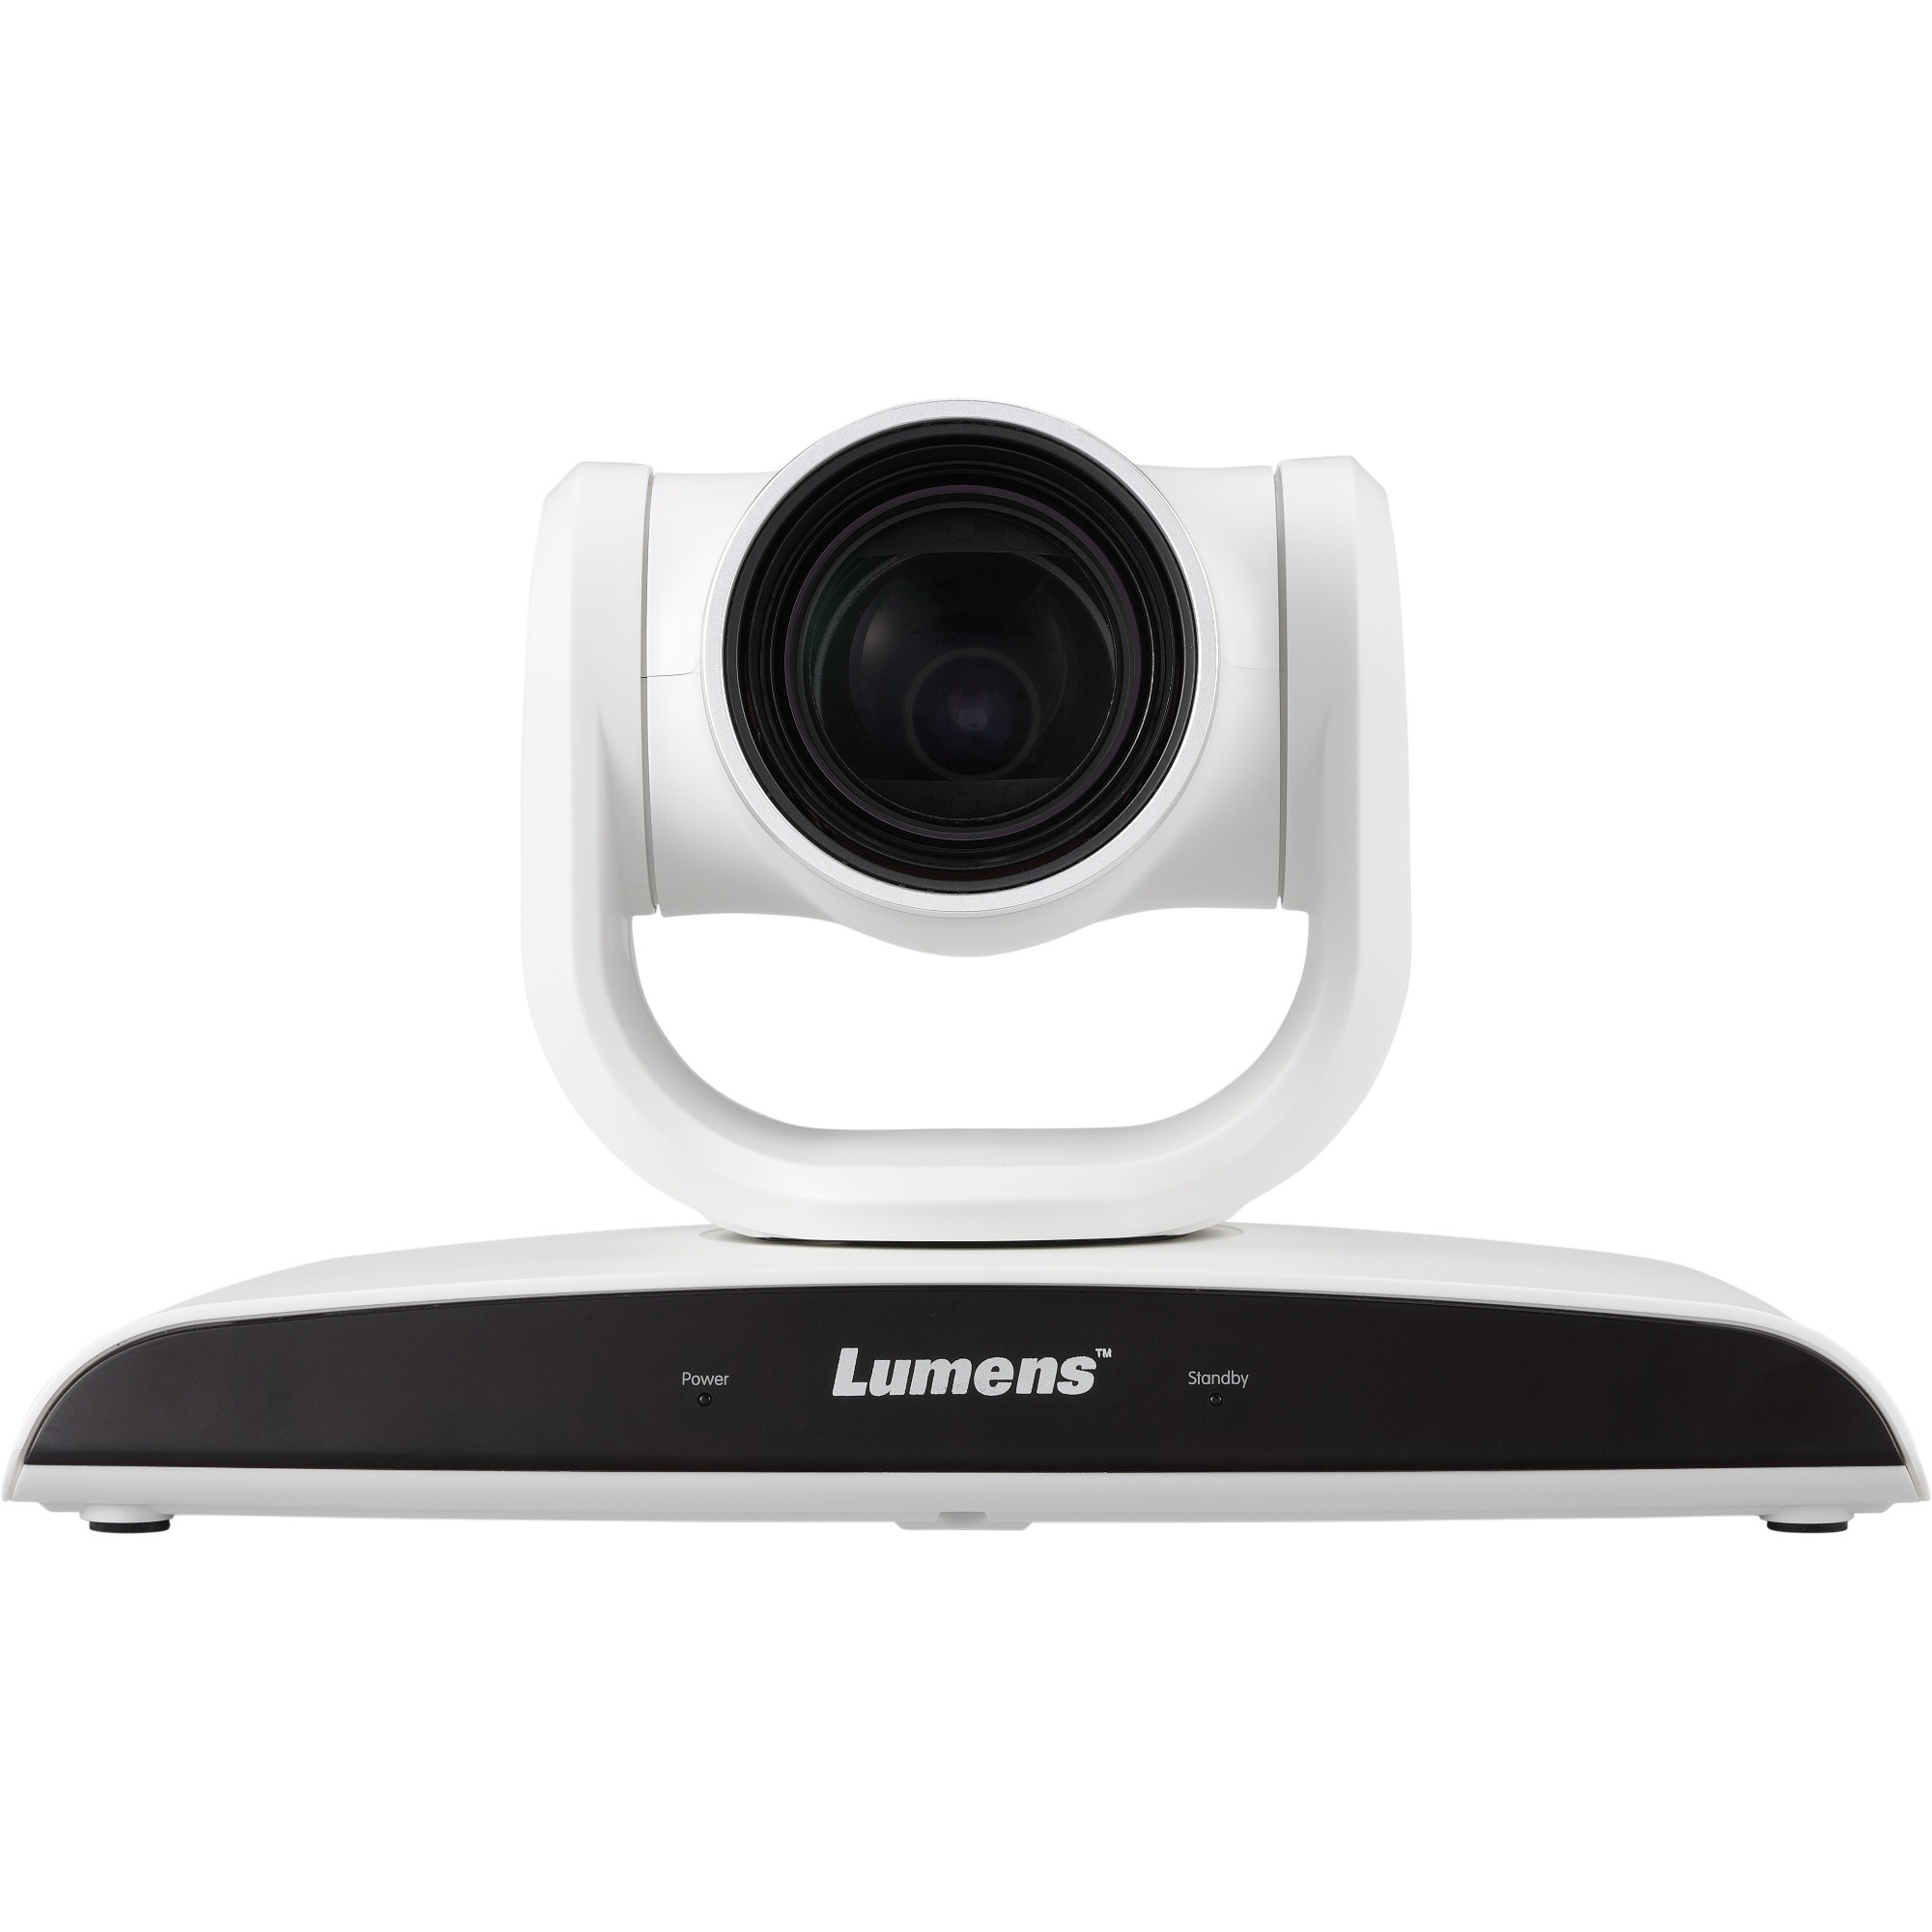 Lumens VC-B30U Video Conferencing Camera - 2 Megapixel - 60 fps - White - USB 3.0_subImage_1